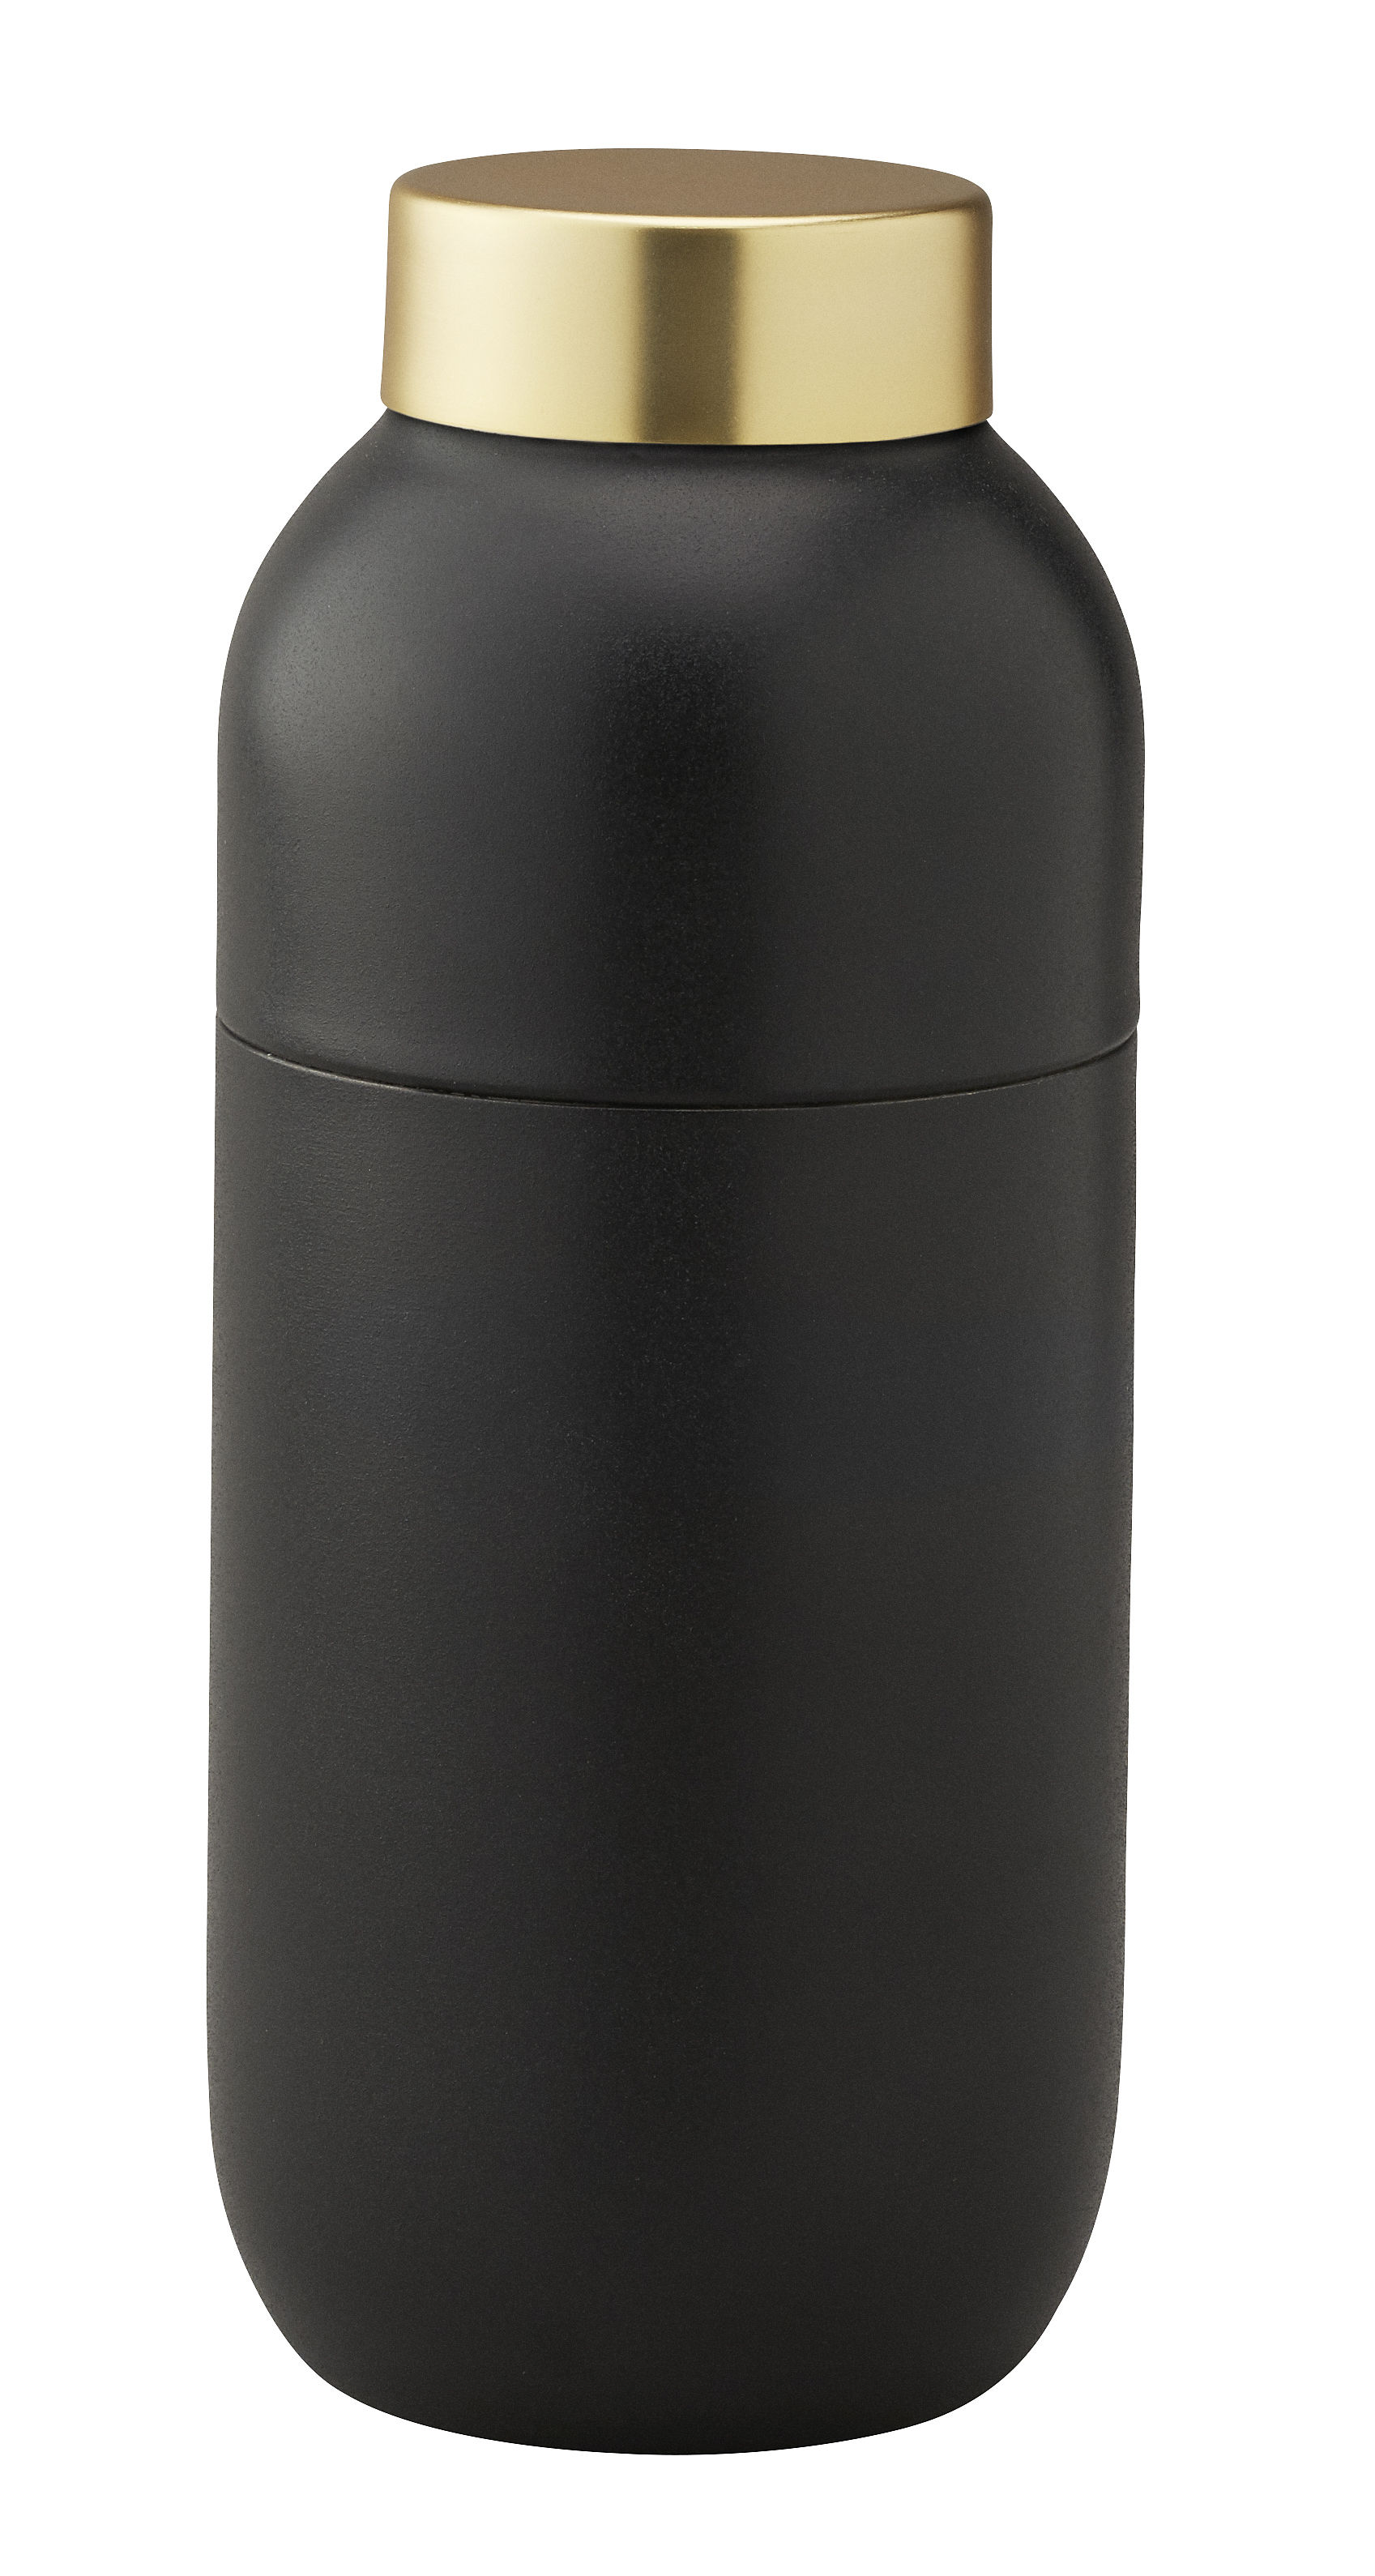 Tischkultur - Tee und Kaffee - Collar Shaker / 500 ml - mit Messbecher 2 & 4 cl - Stelton - Schwarzmatt & messingfarben - Gebürsteter messingbesch. Edelstahl